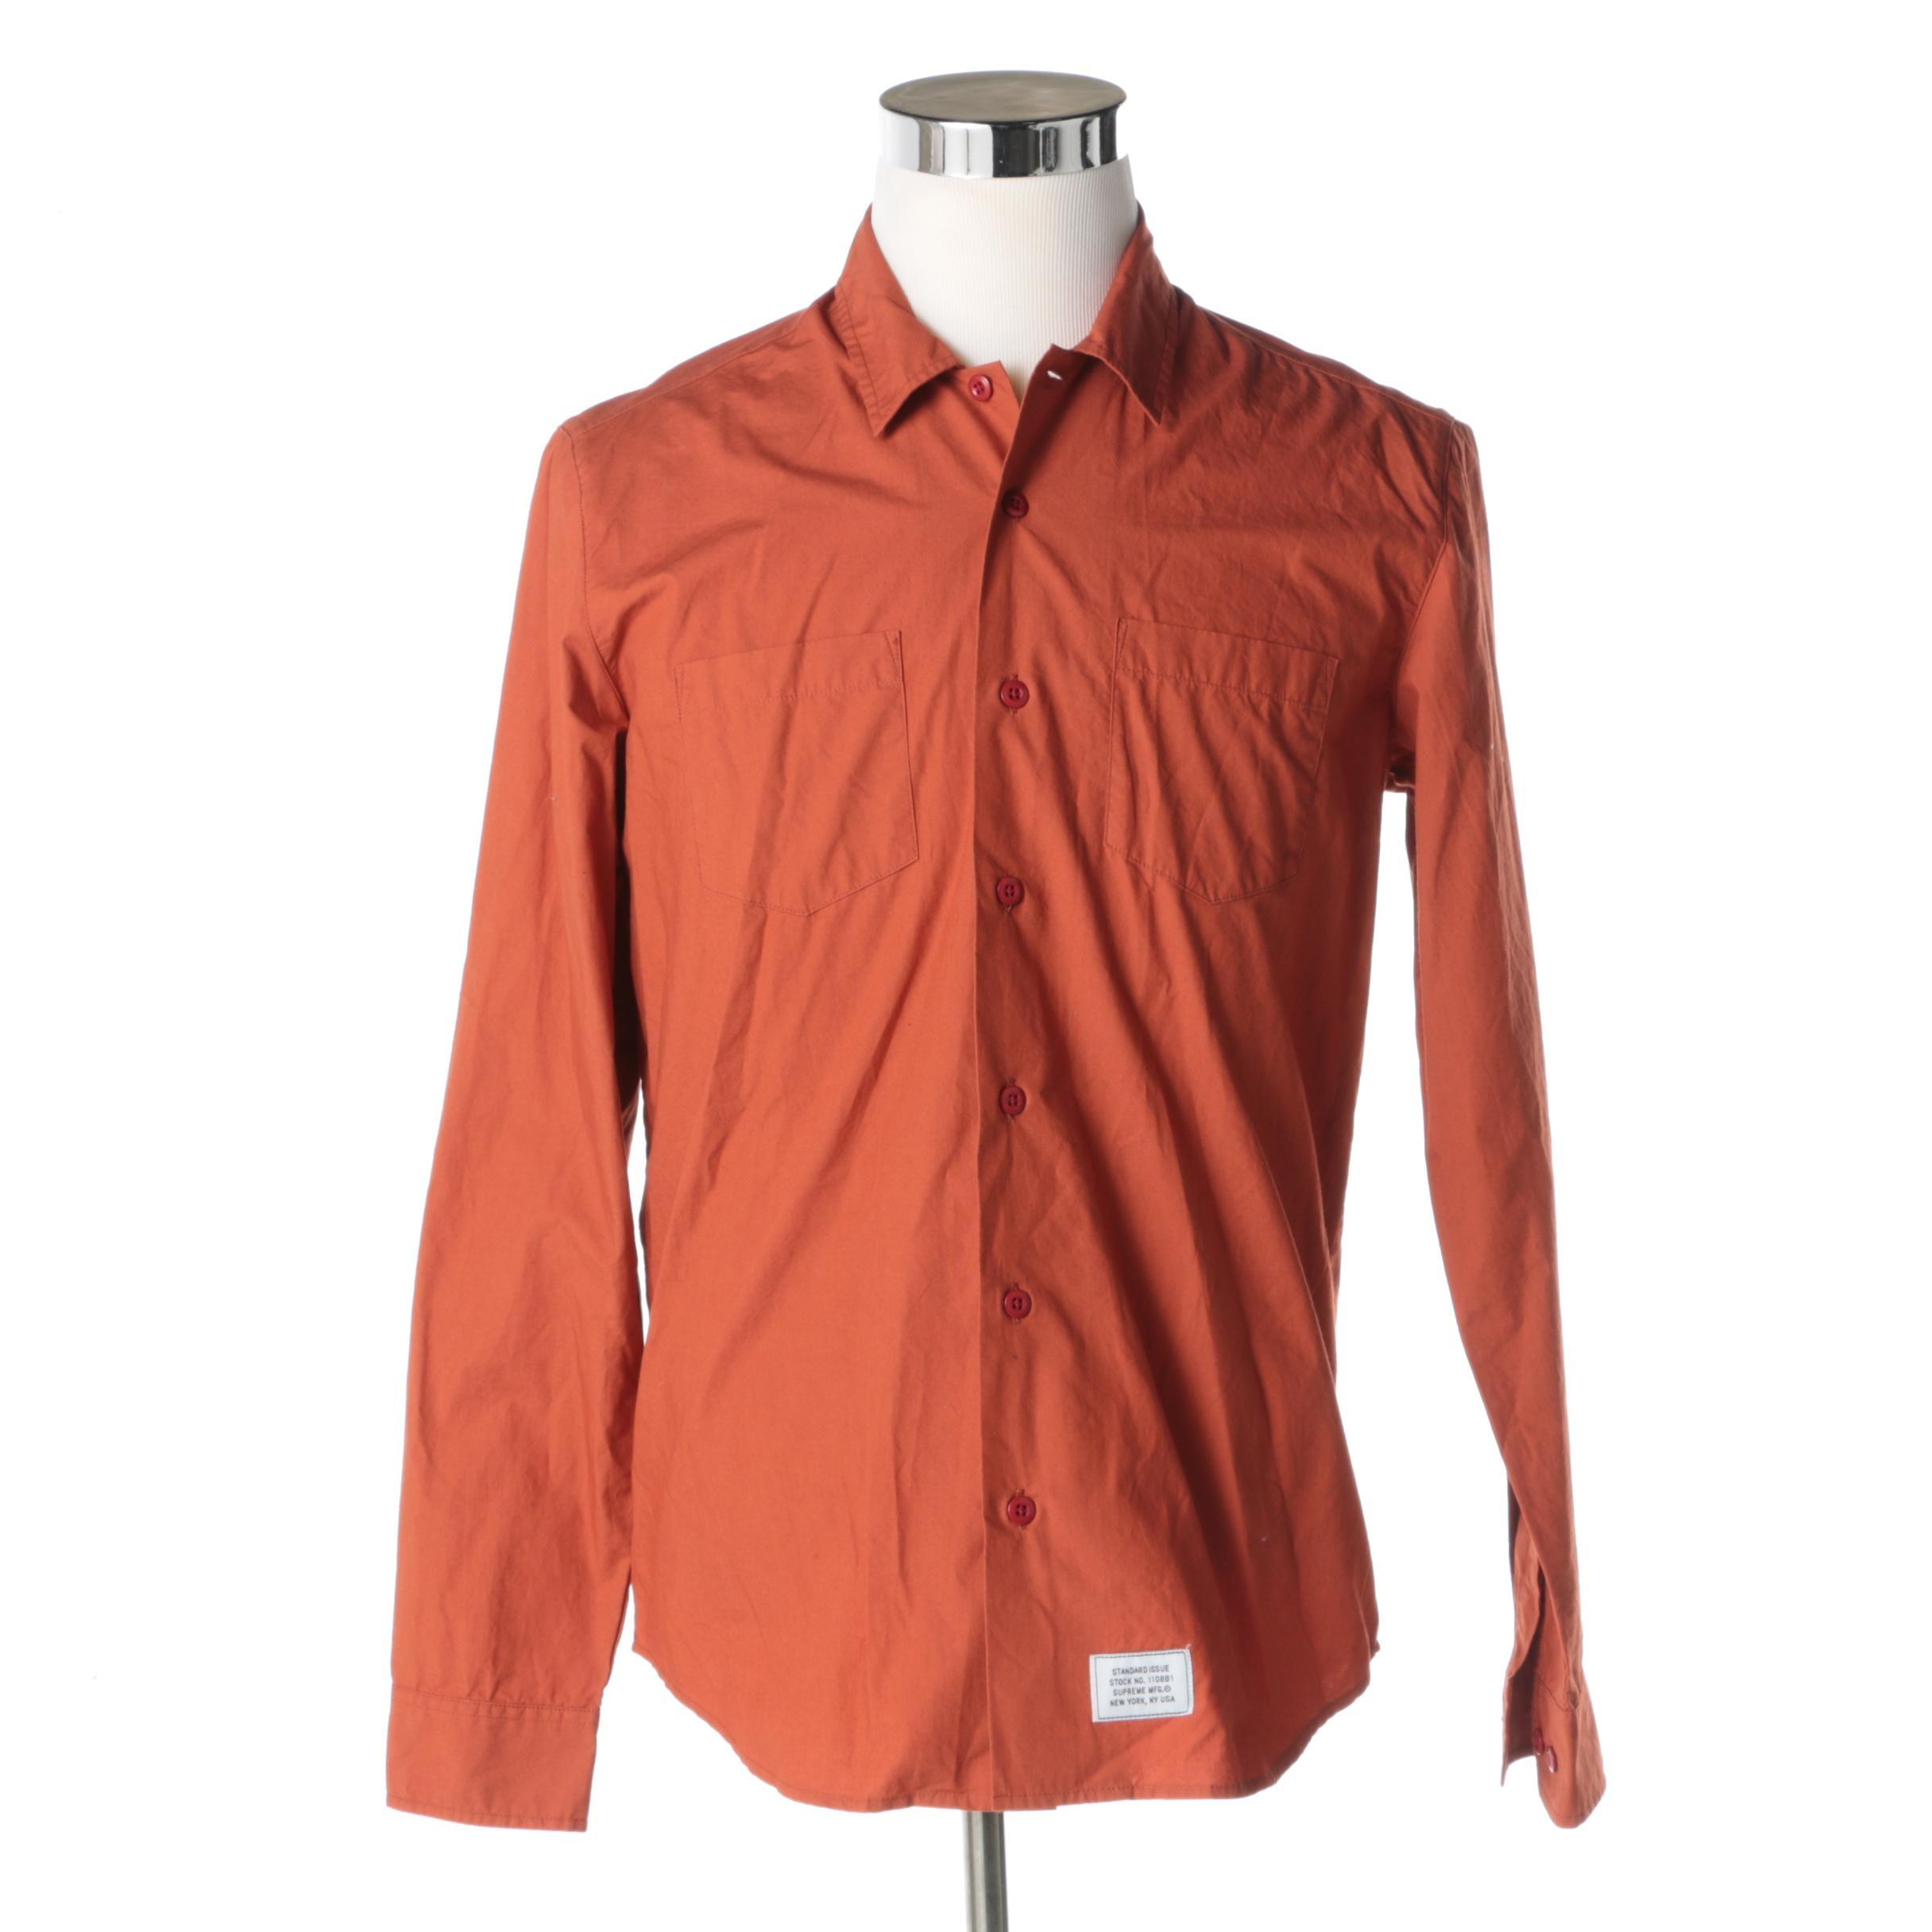 Men's Supreme Button Up Shirt